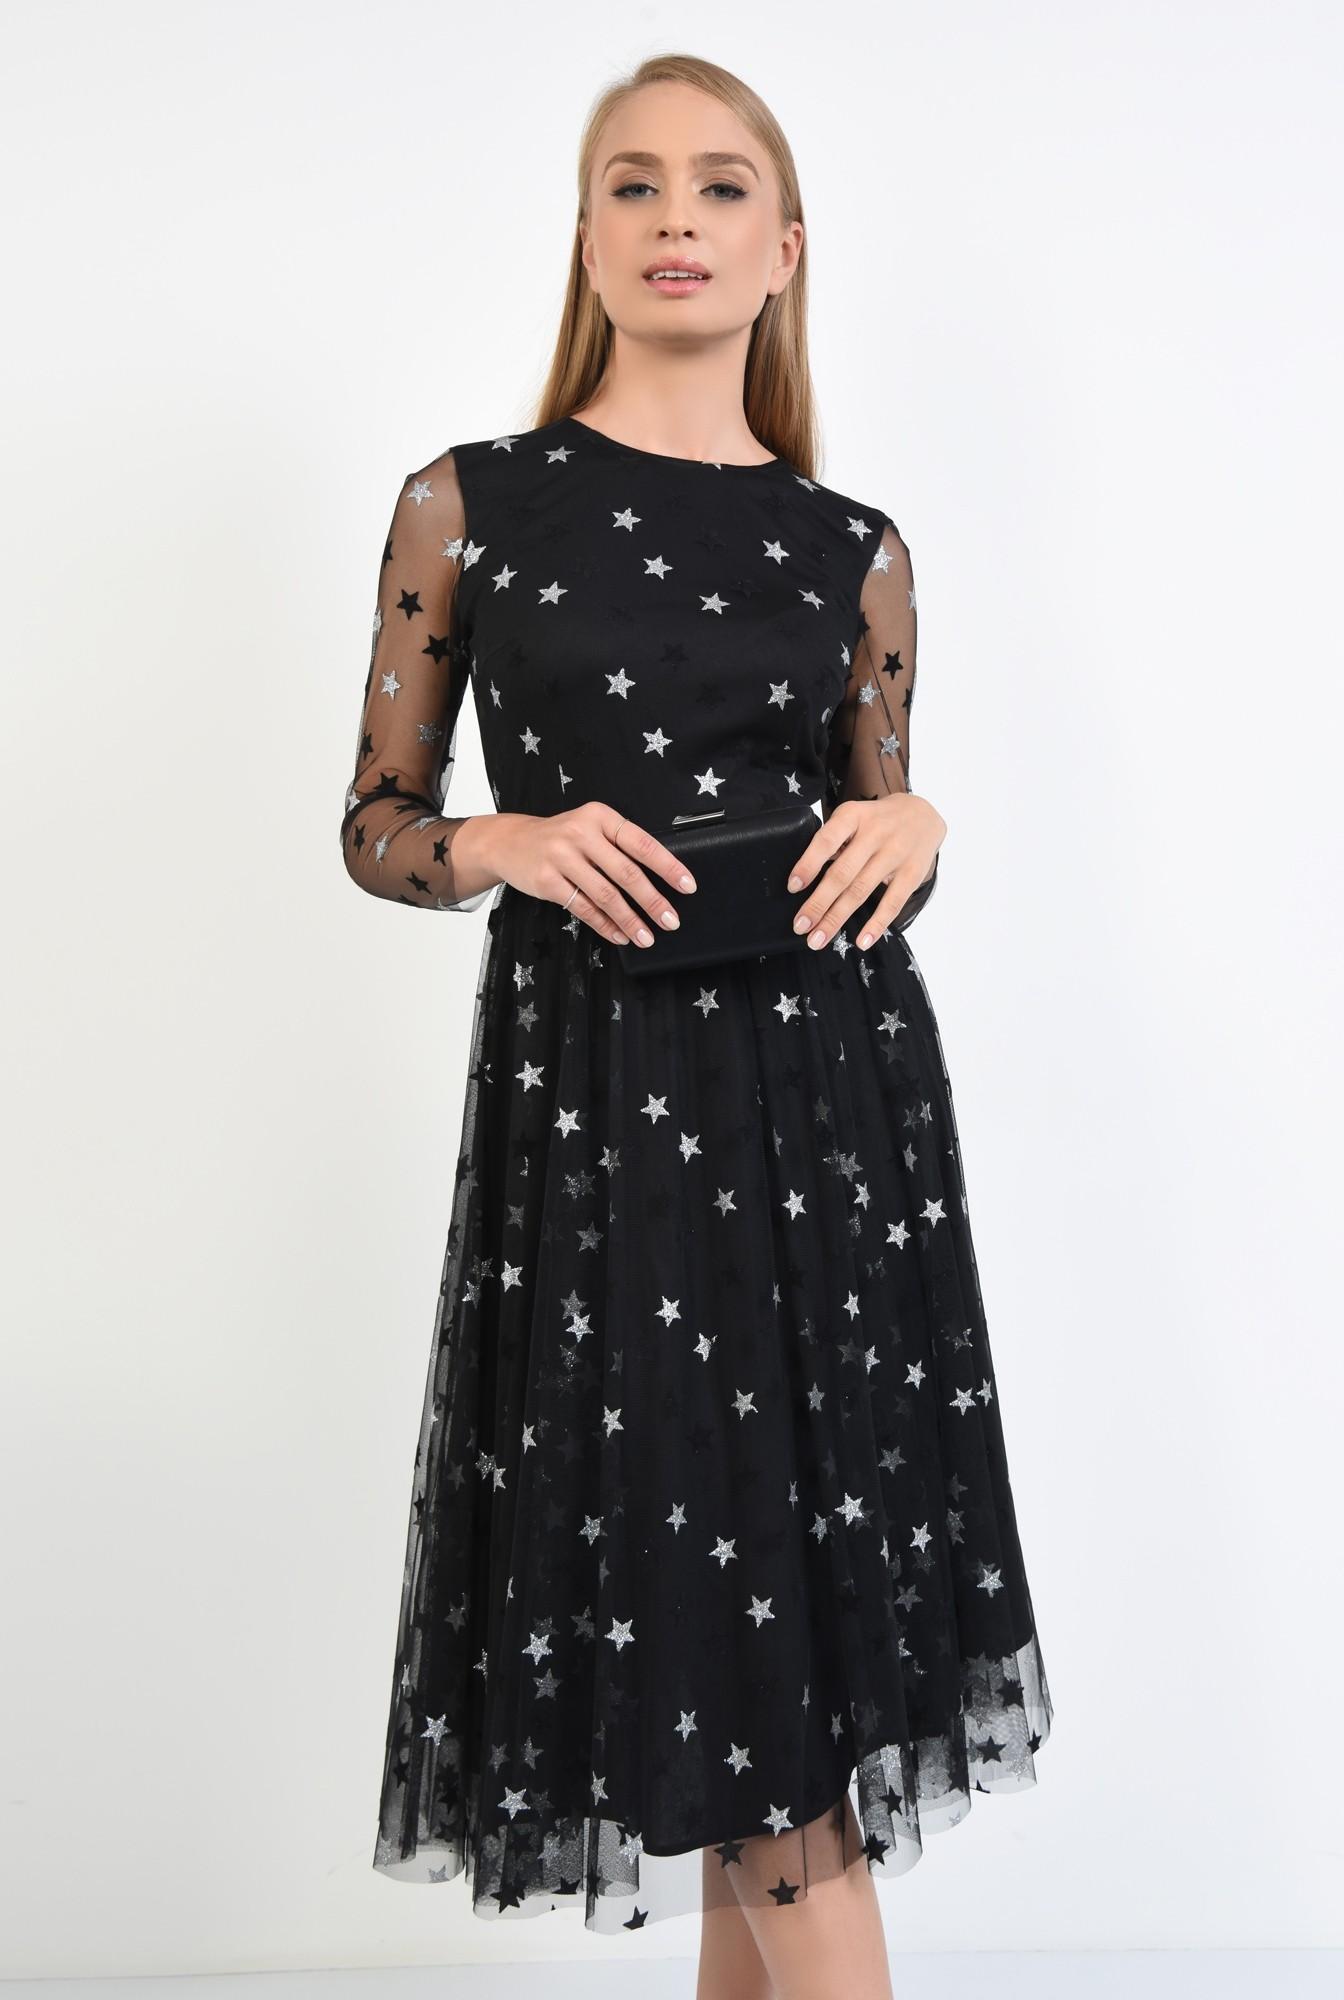 0 - 360 - rochie neagra, croi evazat, cusatura in talie, maneci lungi